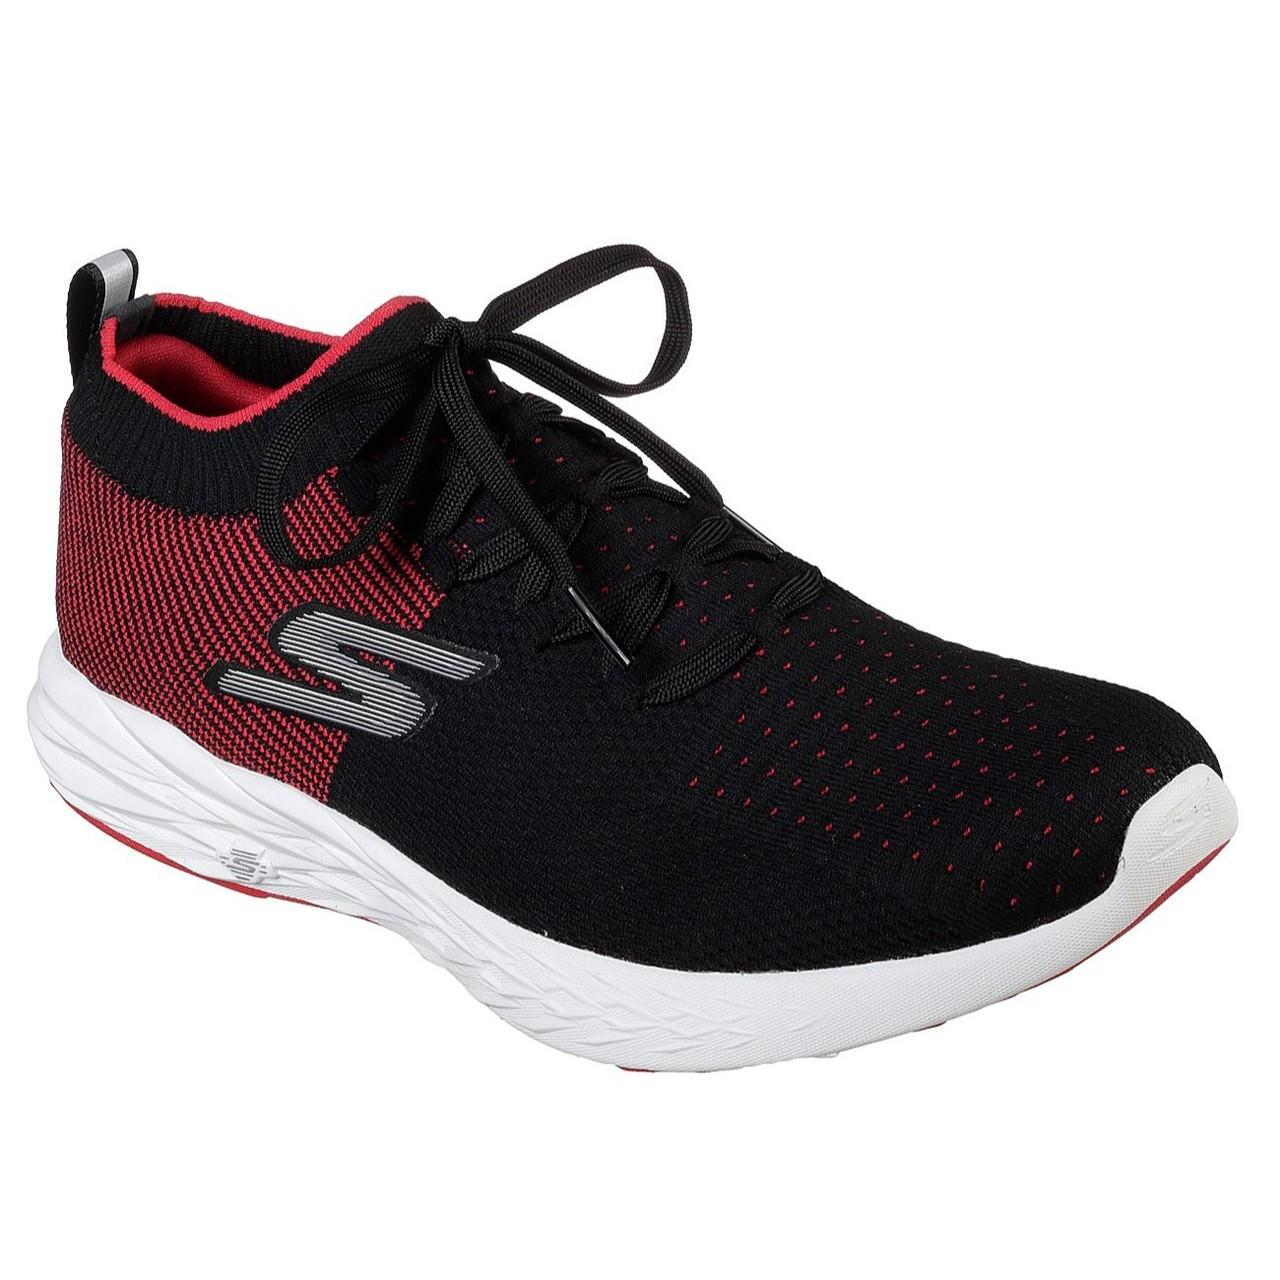 Skechers Men's GOrun 6 Shoe 2018